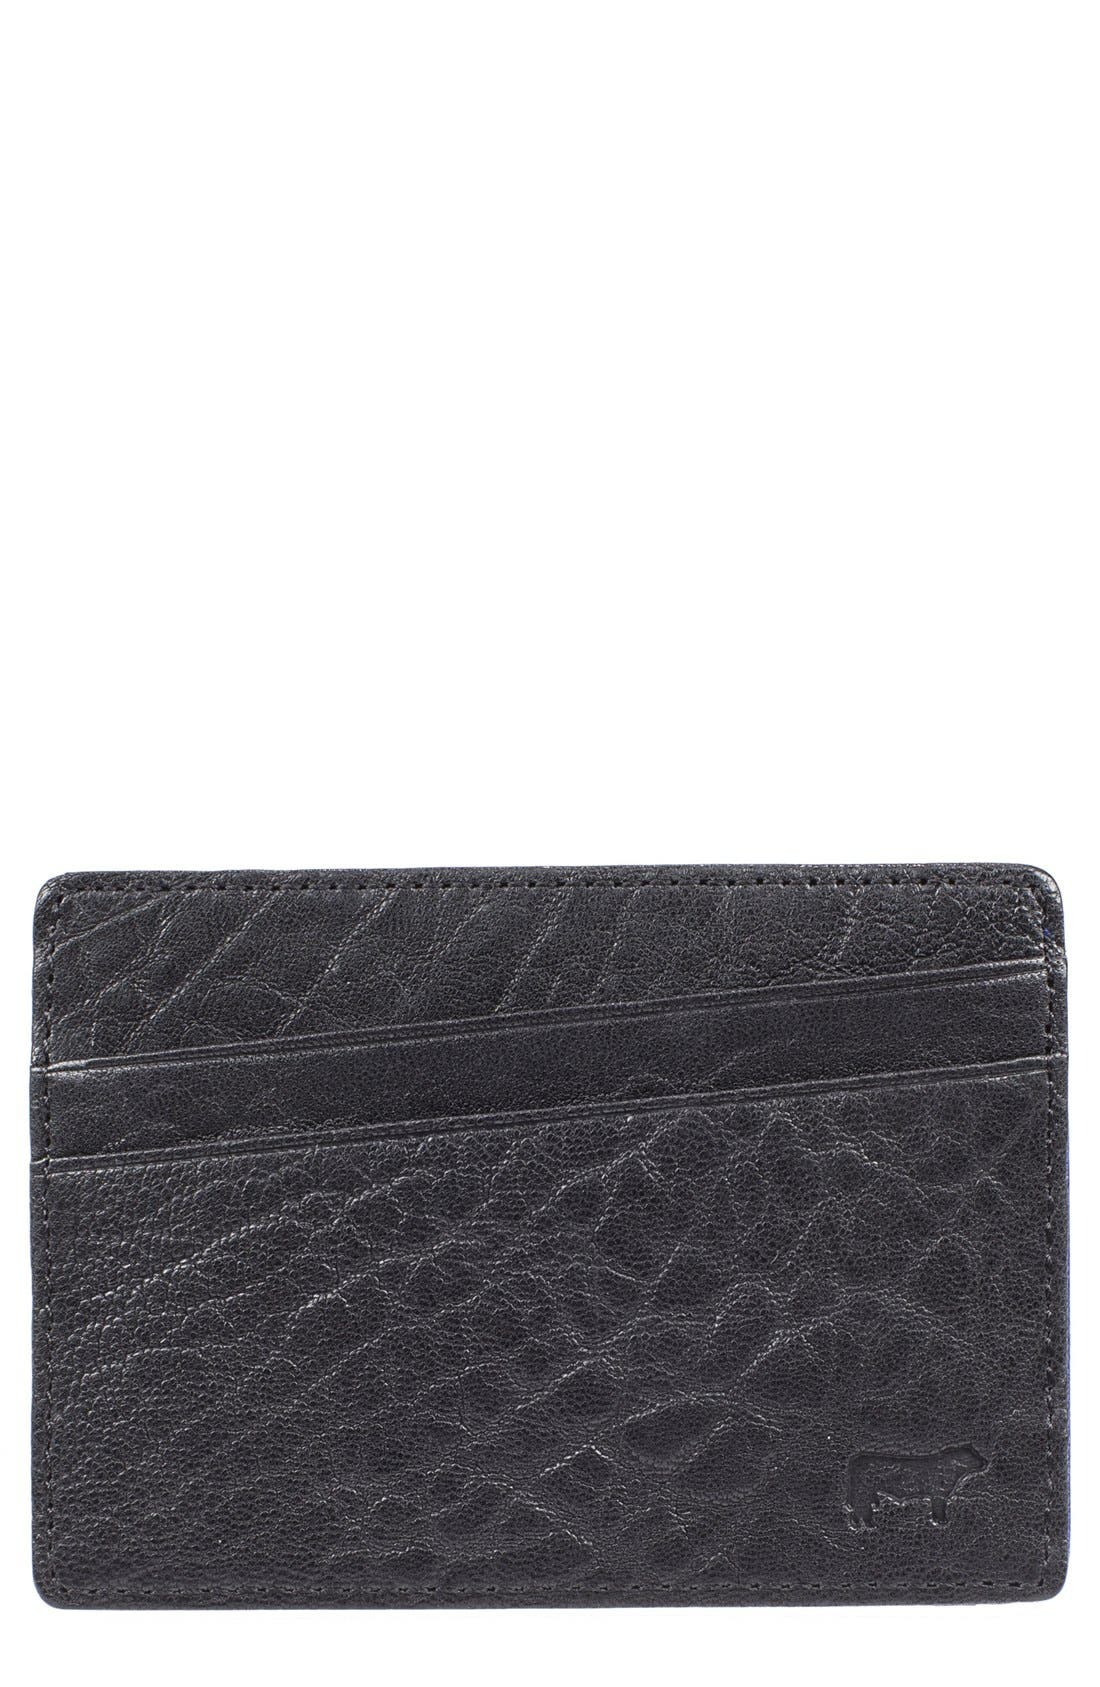 'Quip' Leather Card Case,                             Main thumbnail 1, color,                             012